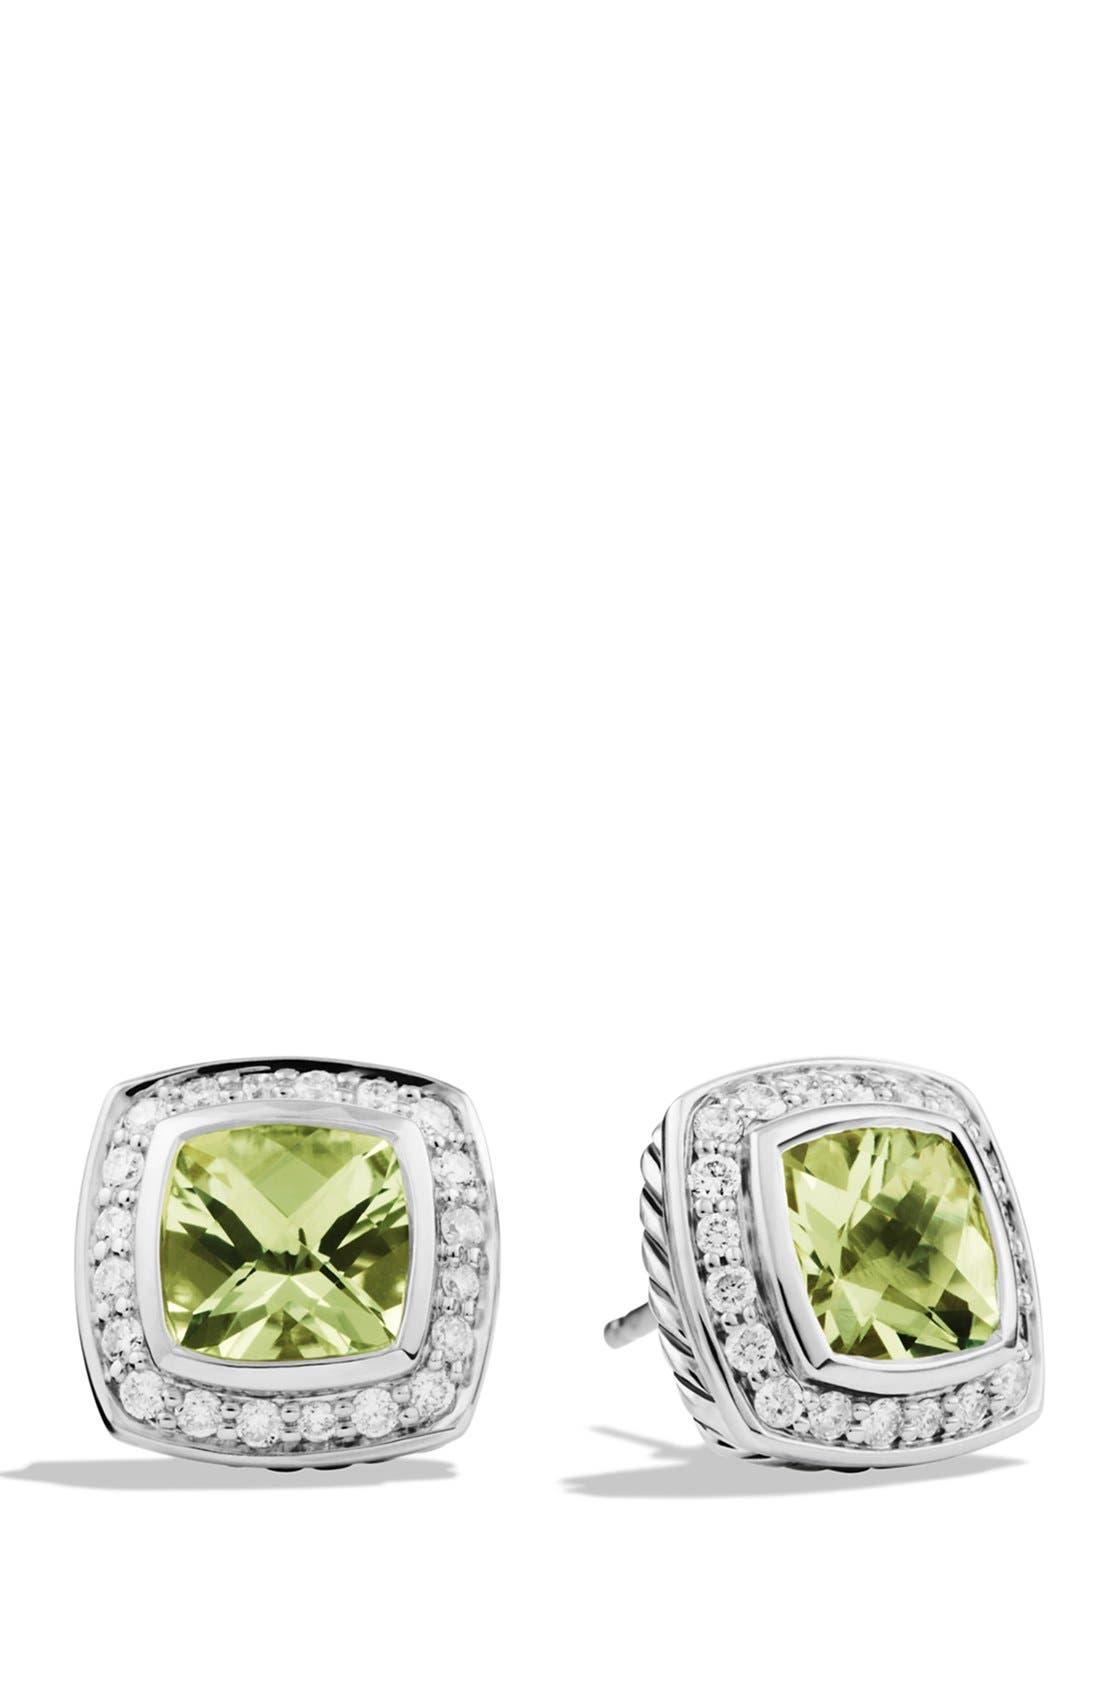 Alternate Image 1 Selected - David Yurman 'Albion' Petite Earrings with Semiprecious Stones & Diamonds